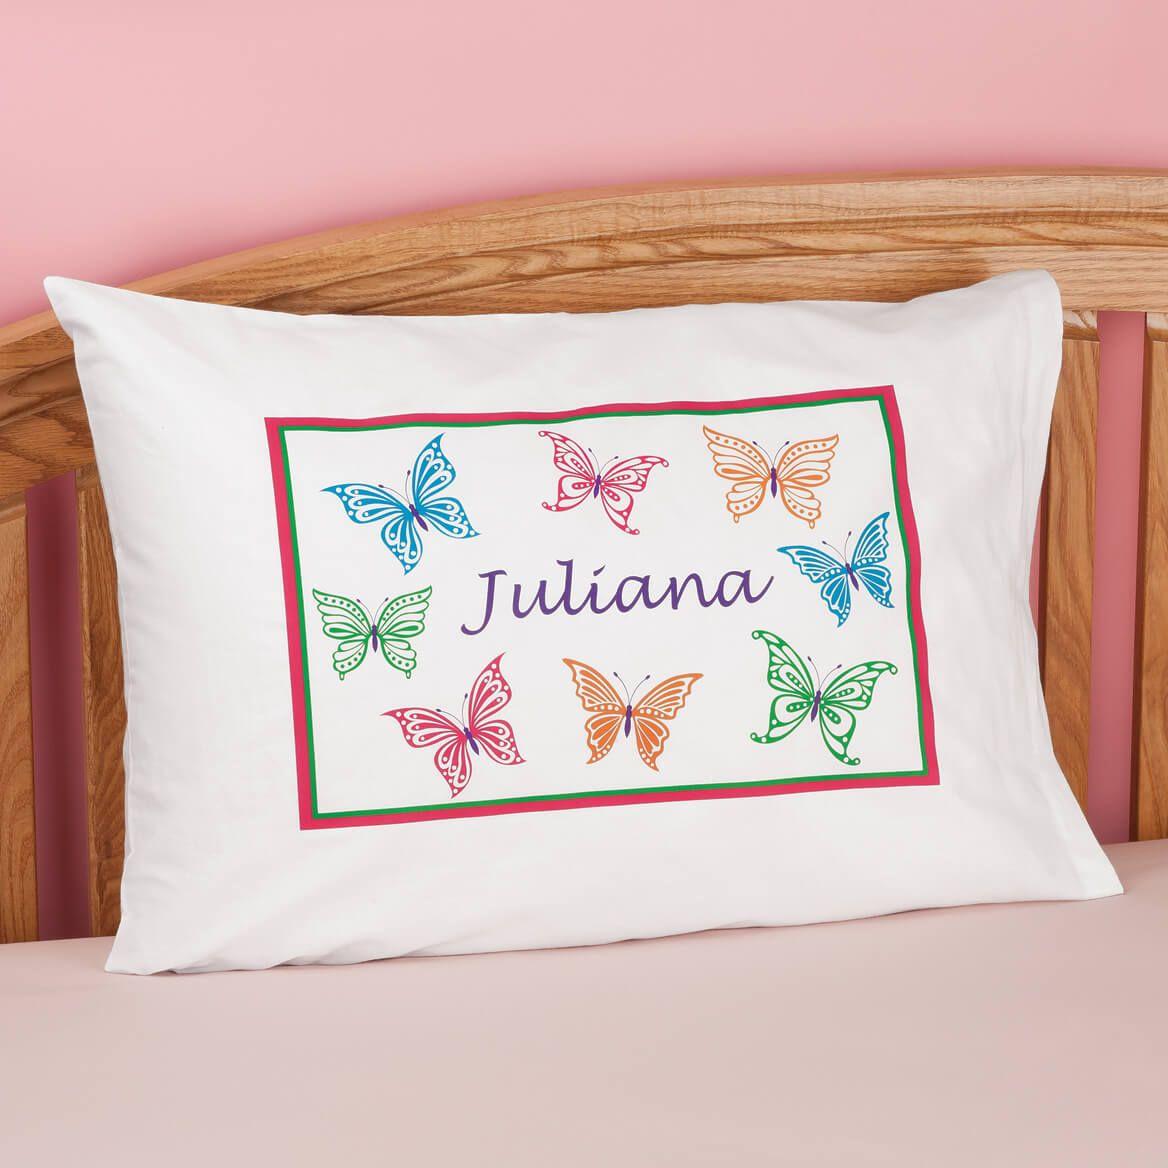 Personalized Butterflies Pillowcase-350018